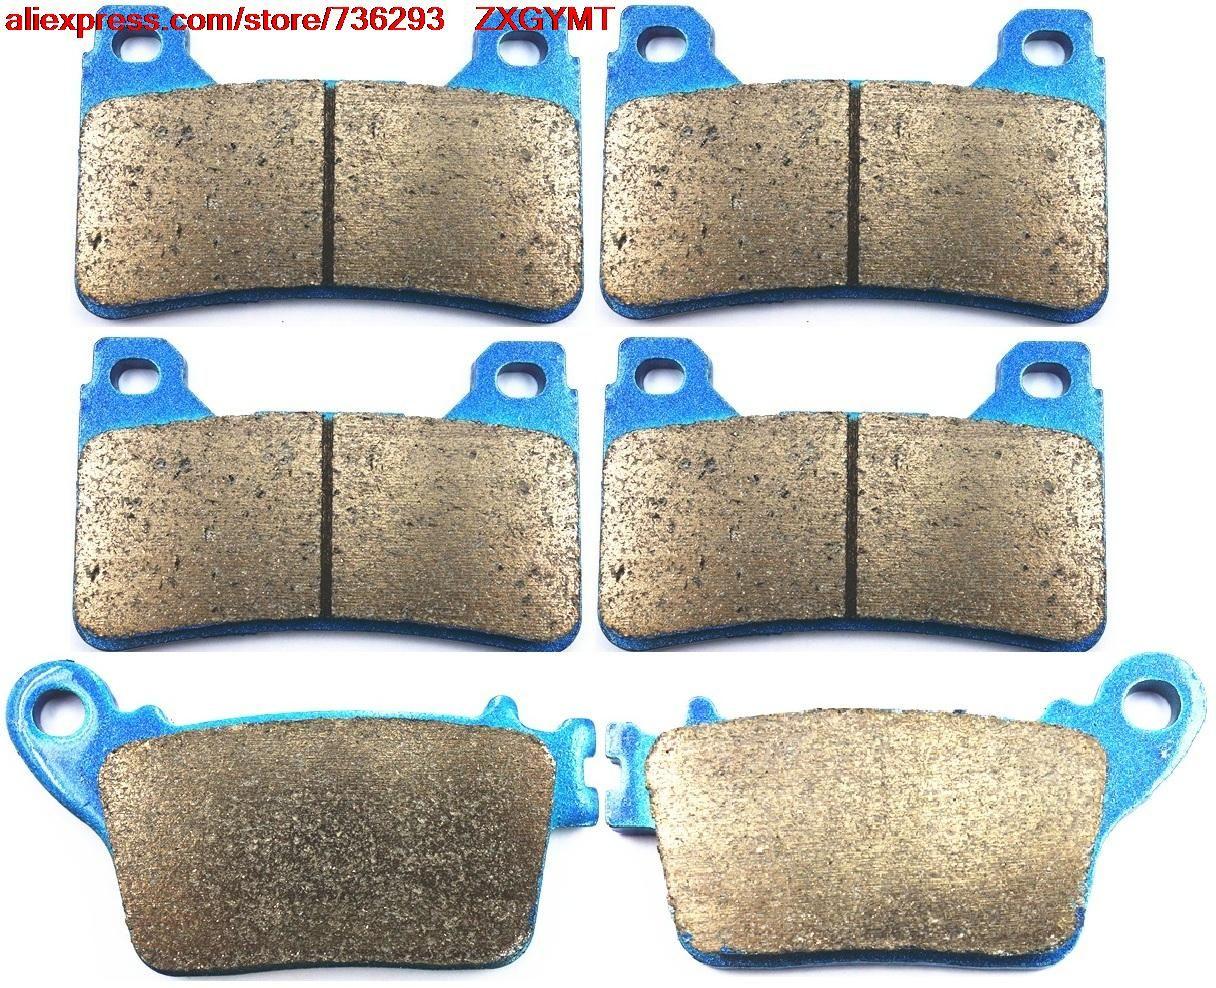 Sintered Road Racing Brake Pads Set fit HONDA CBR1000 CBR1000RR CBR 1000 RR Fireblade ( Rad.cal ) 2006 - 2007